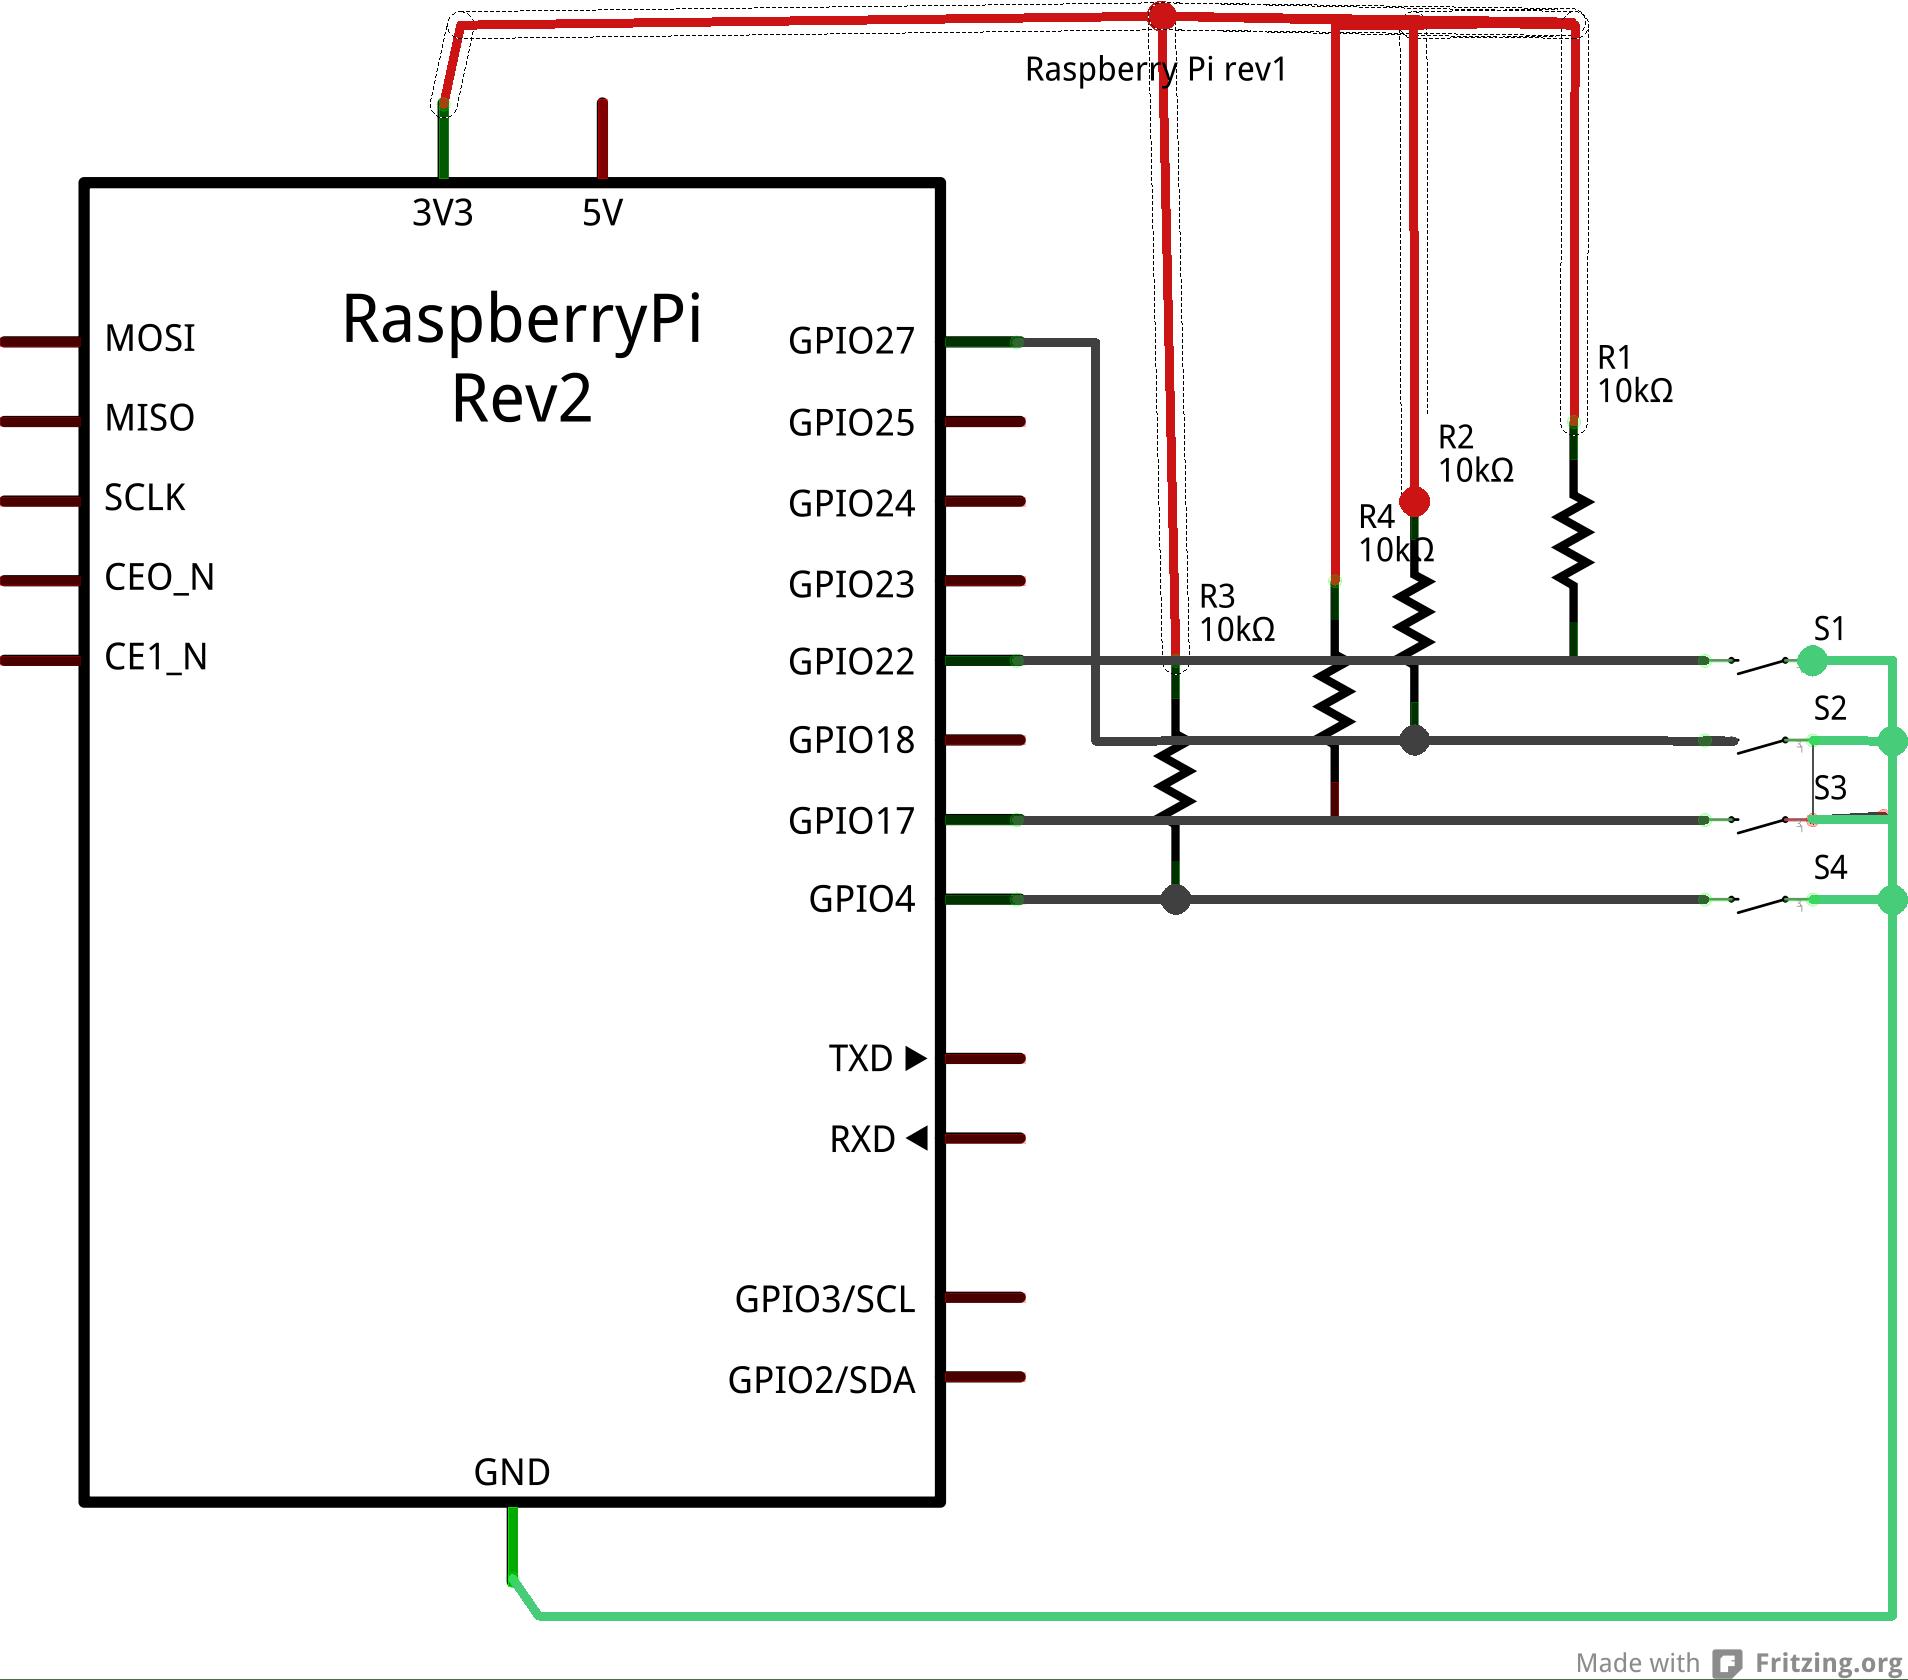 raspberry pi 2 wiring diagram 94 ford explorer speaker project ideas let make phone